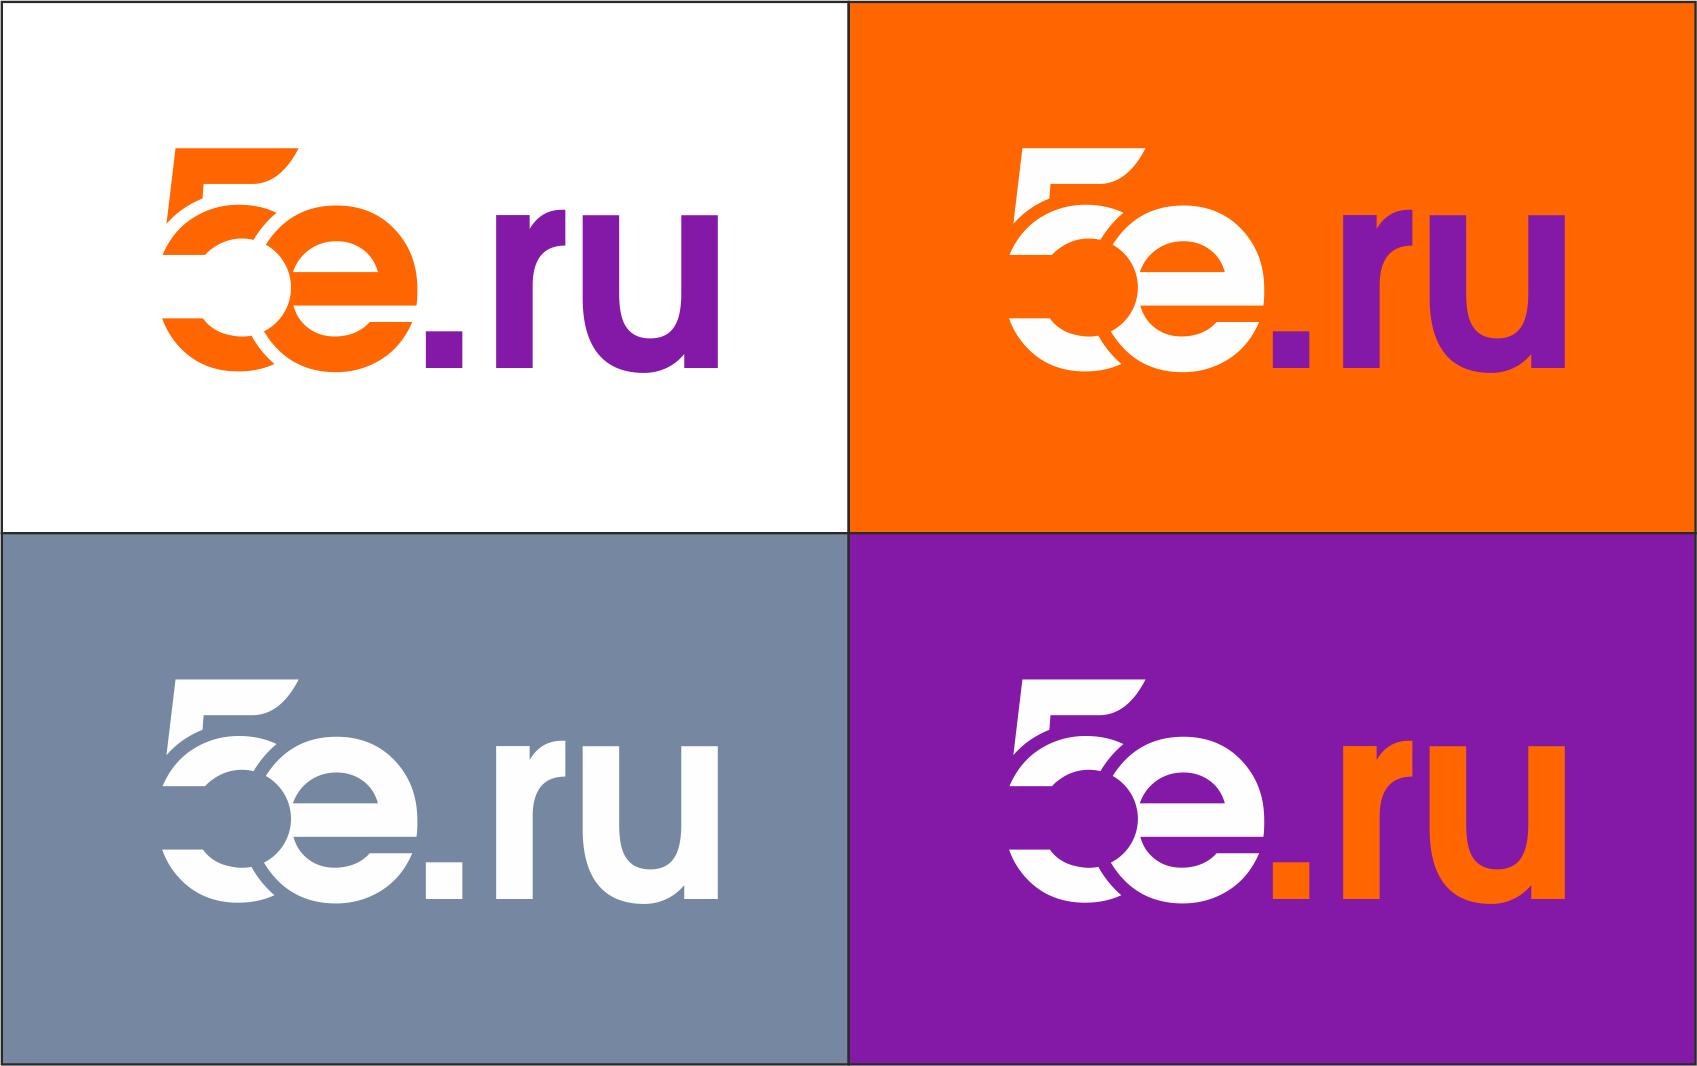 Нарисовать логотип для группы компаний  фото f_5065cdce40f6406f.png